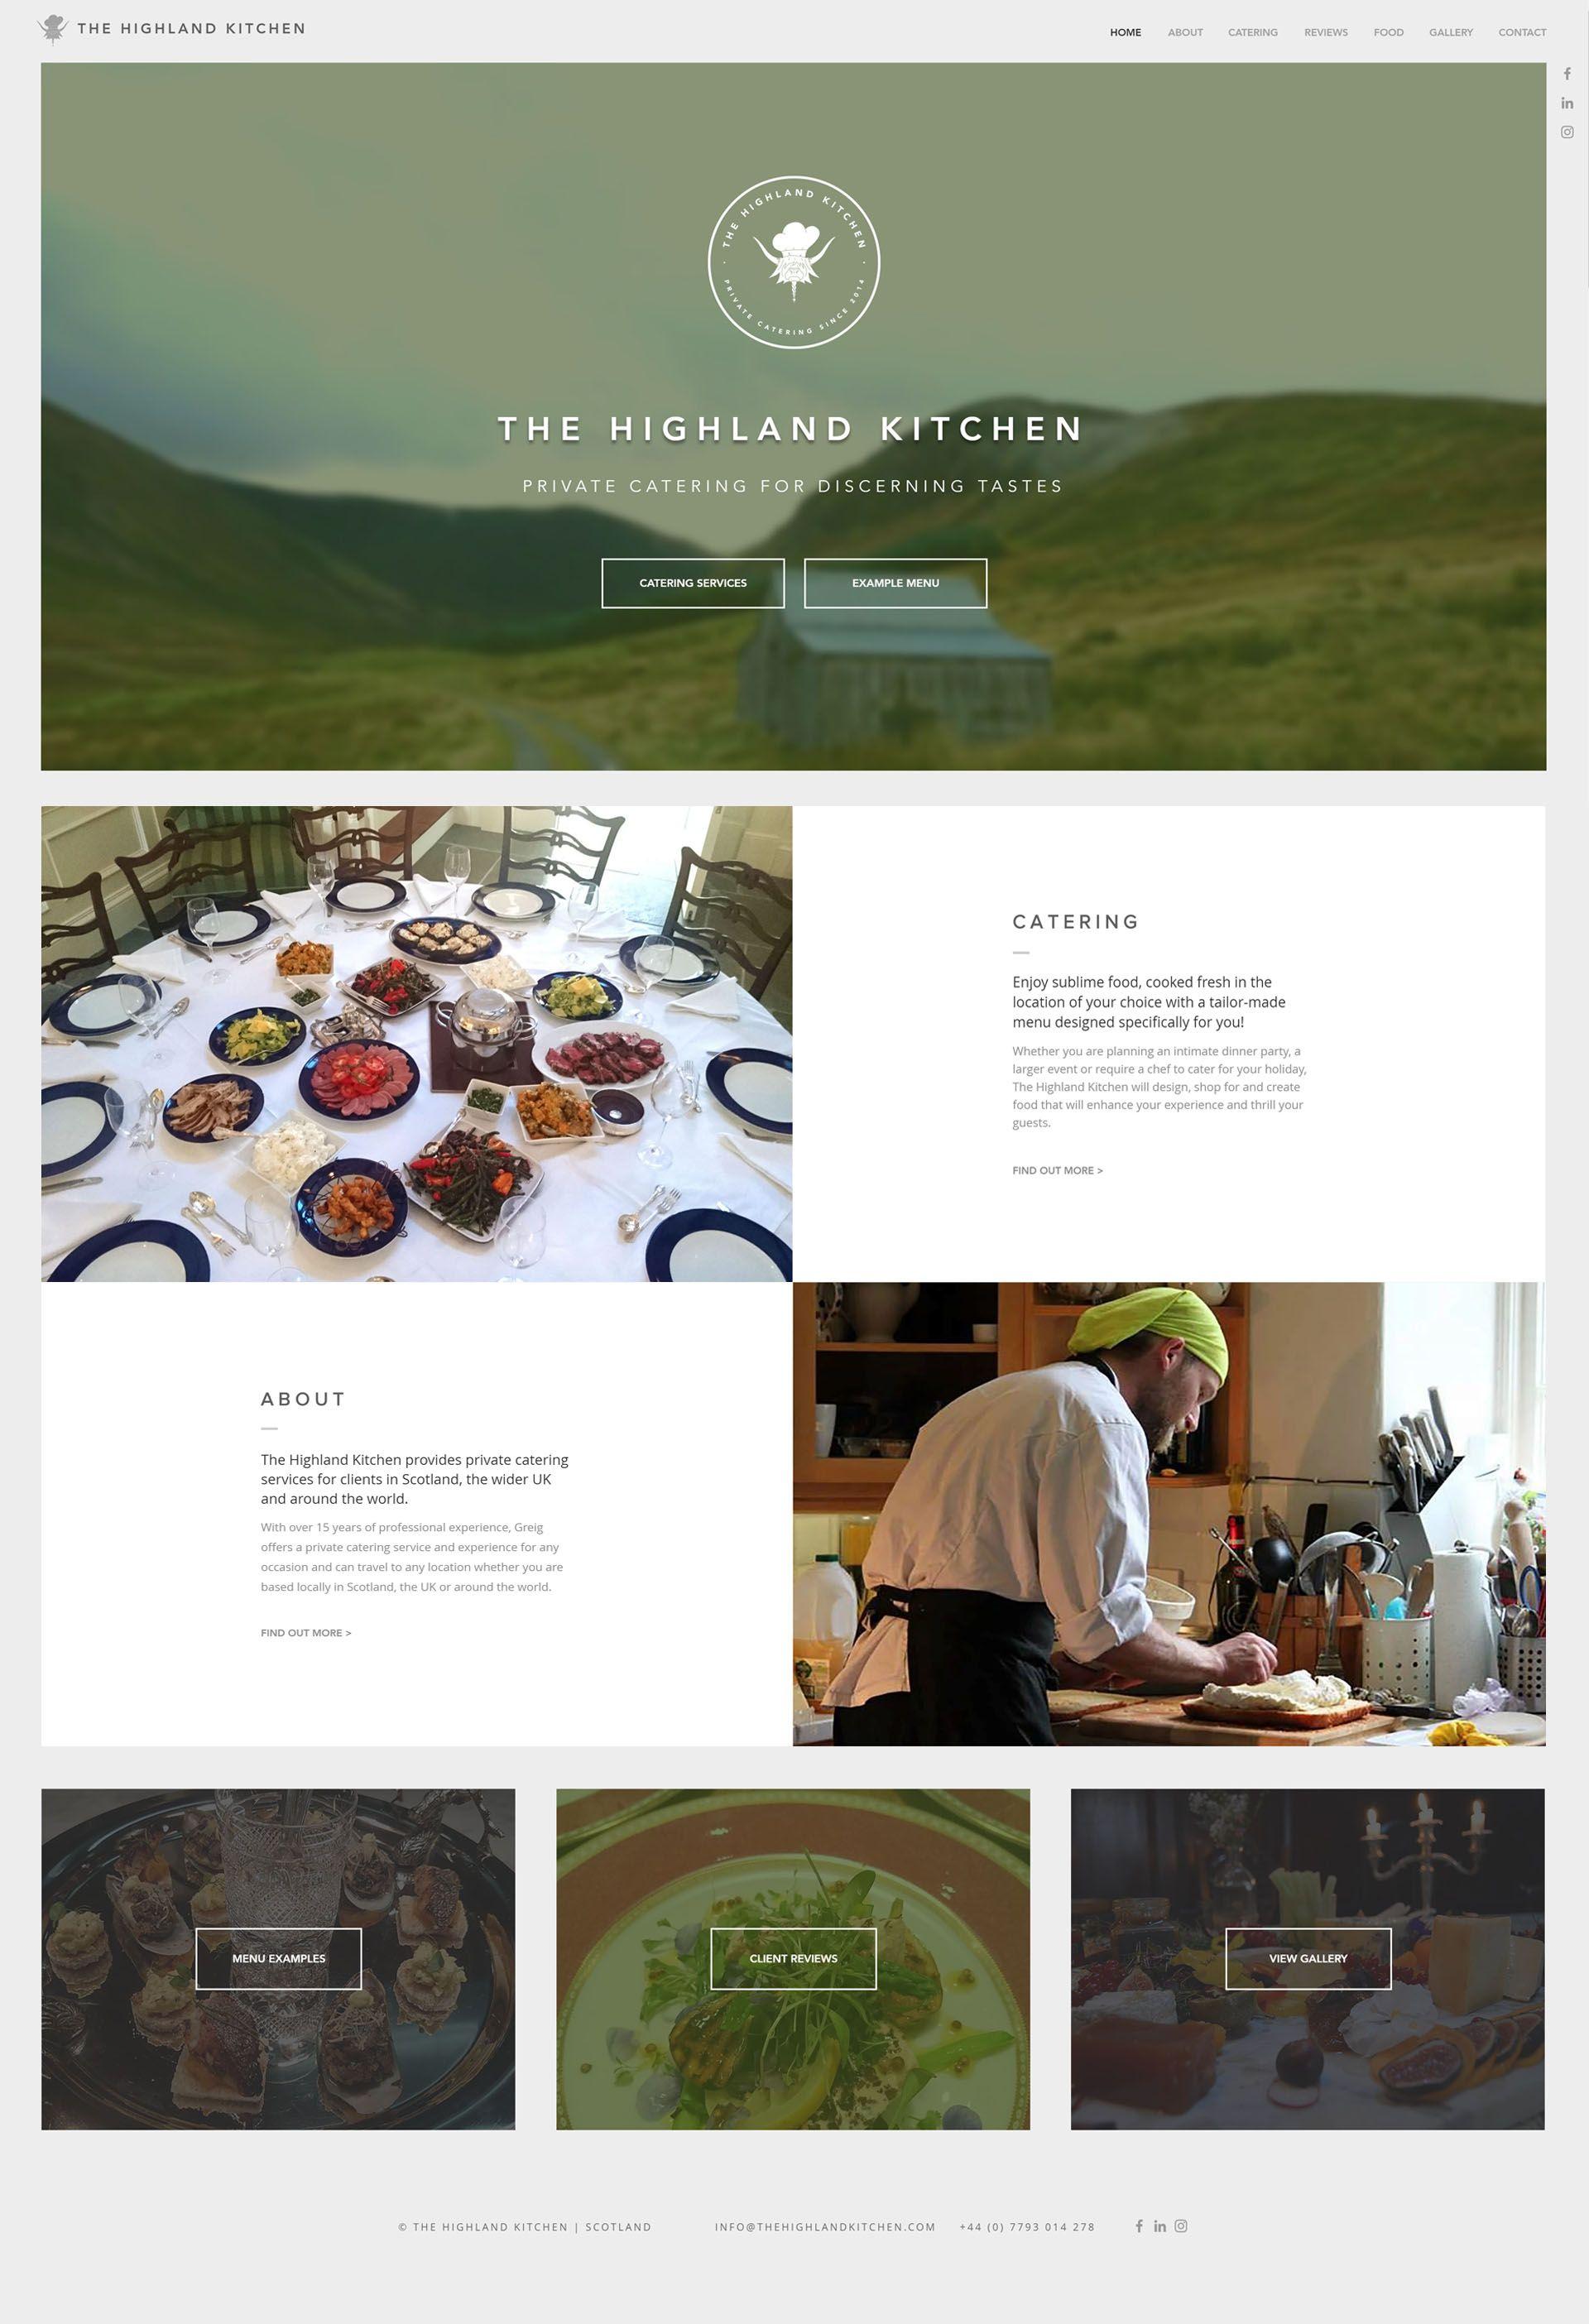 Website Designed And Developed On The Wix Platform We Create Stunning Websites On The Wix Platform Each One Wix Web Design Wix Website Design Website Design